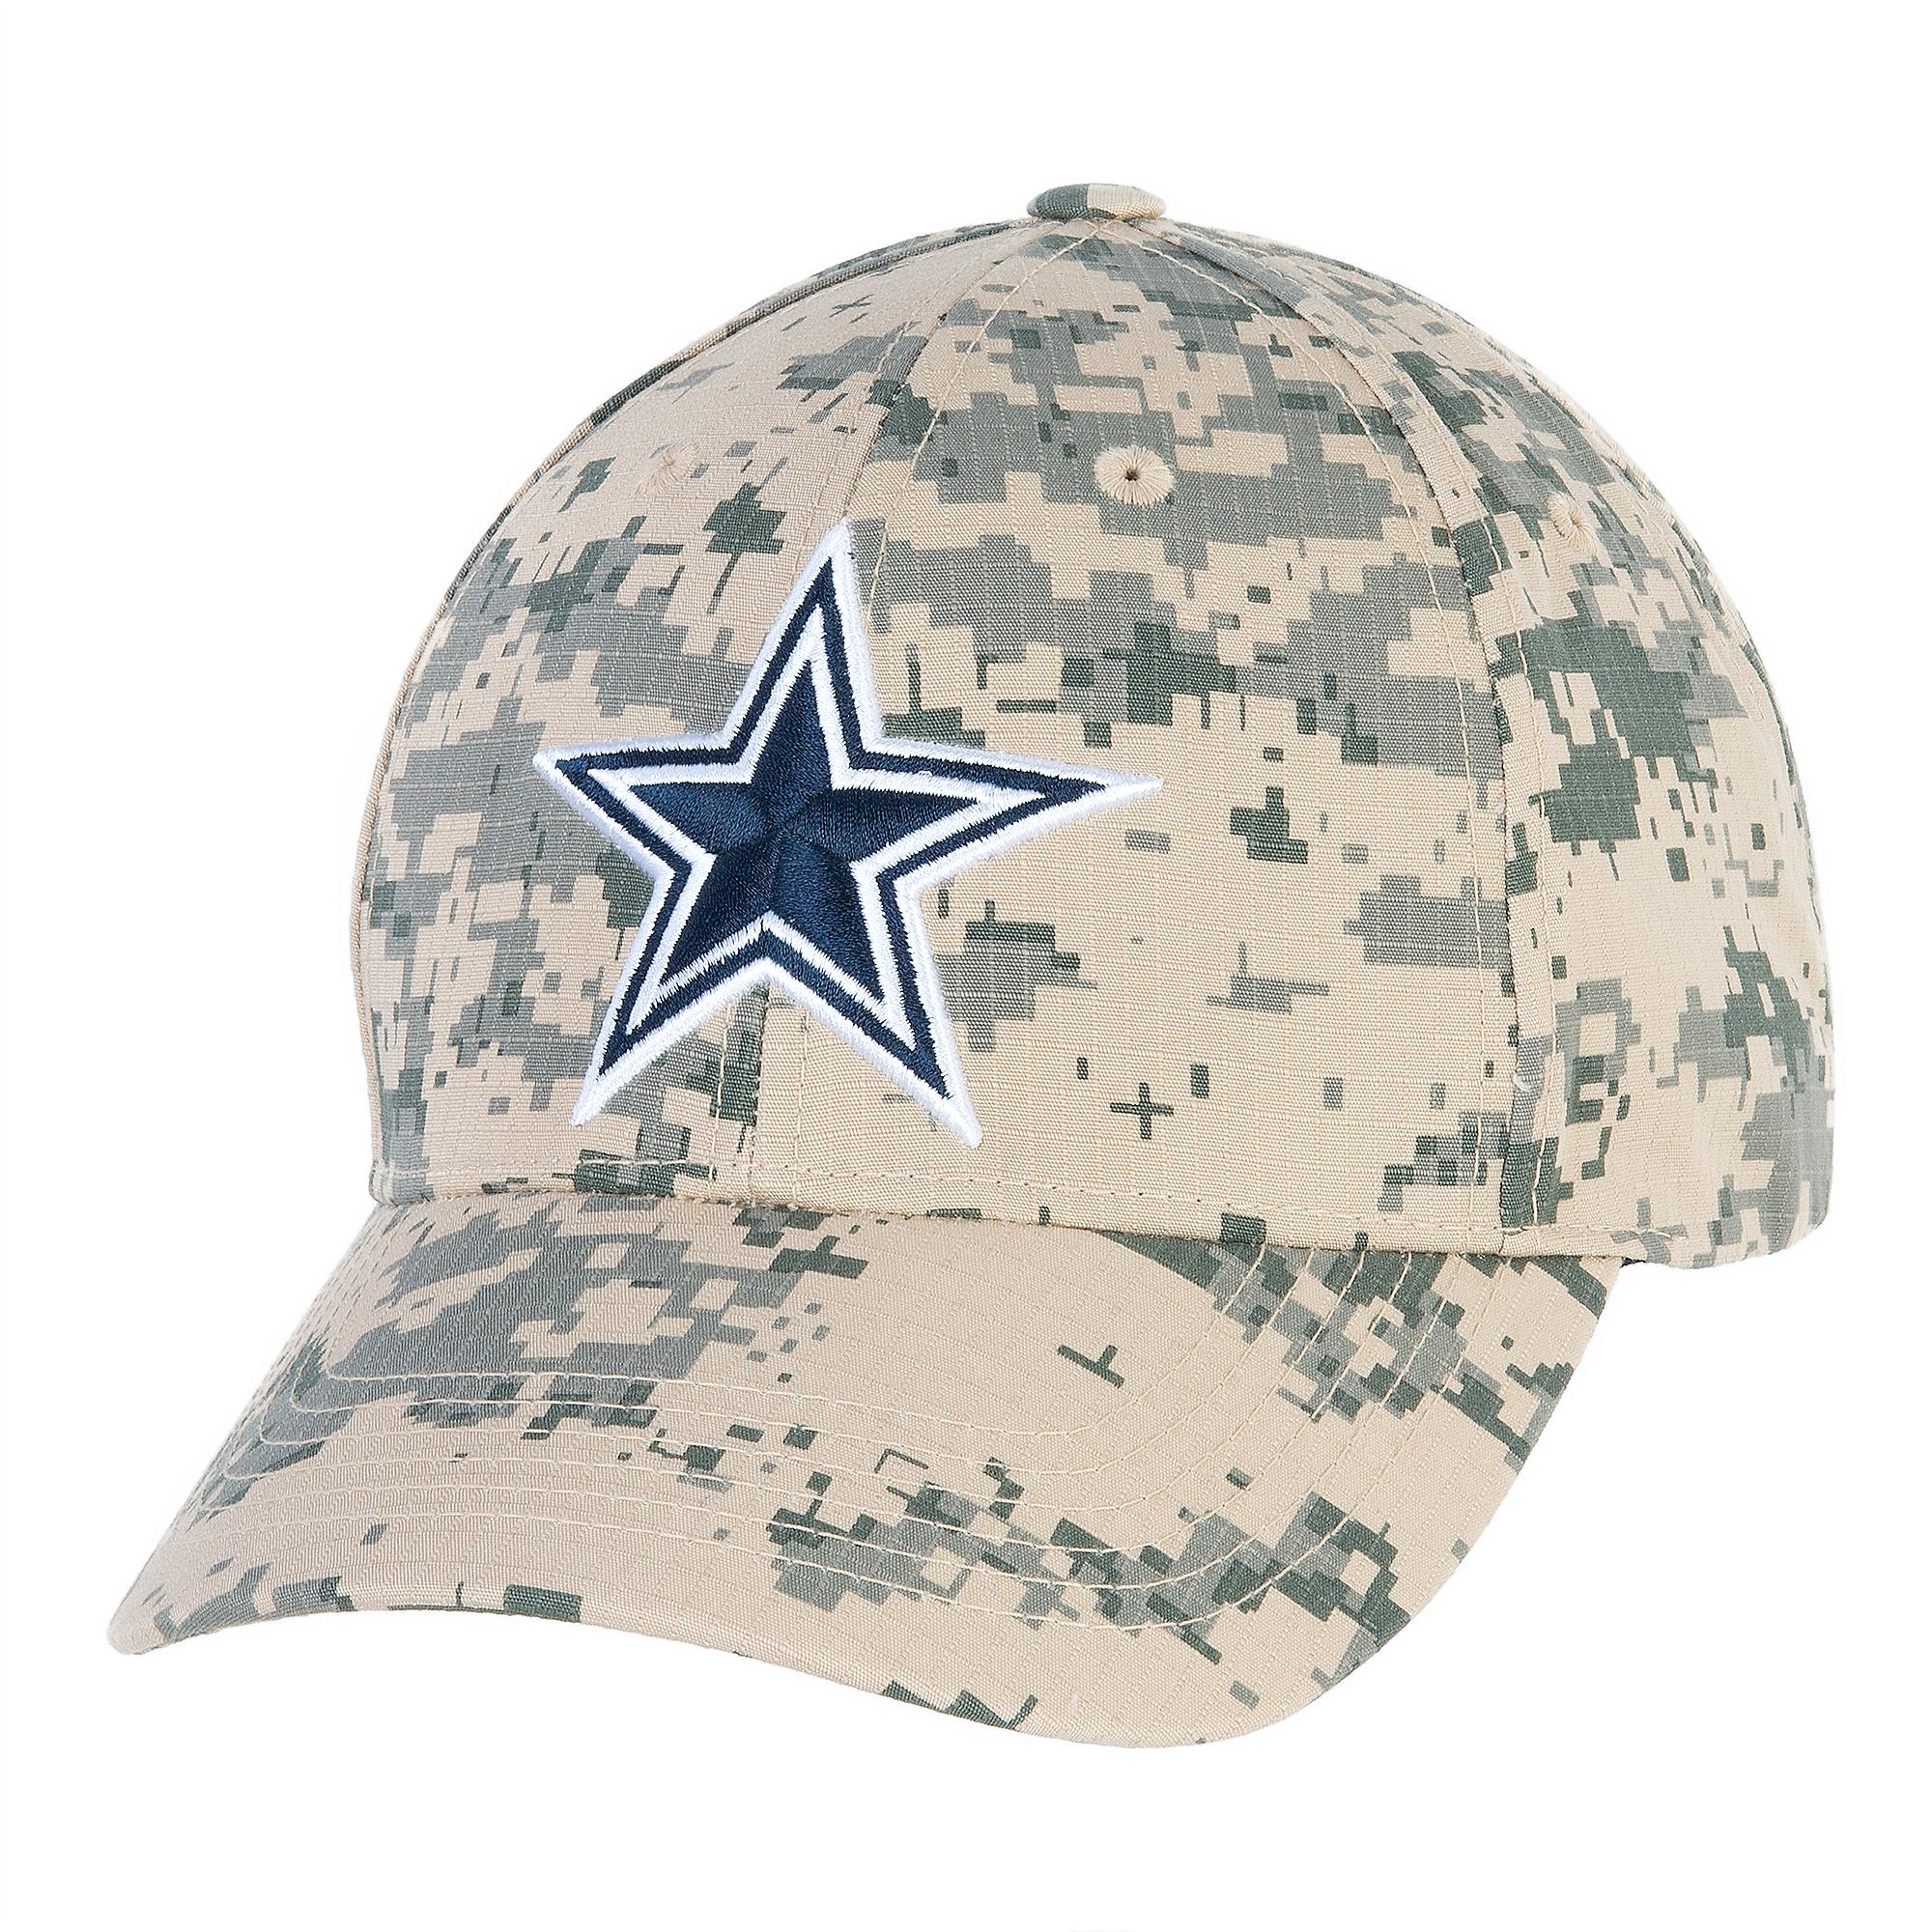 73a5cb725 Dallas Cowboys Washed Digital Camo Cap